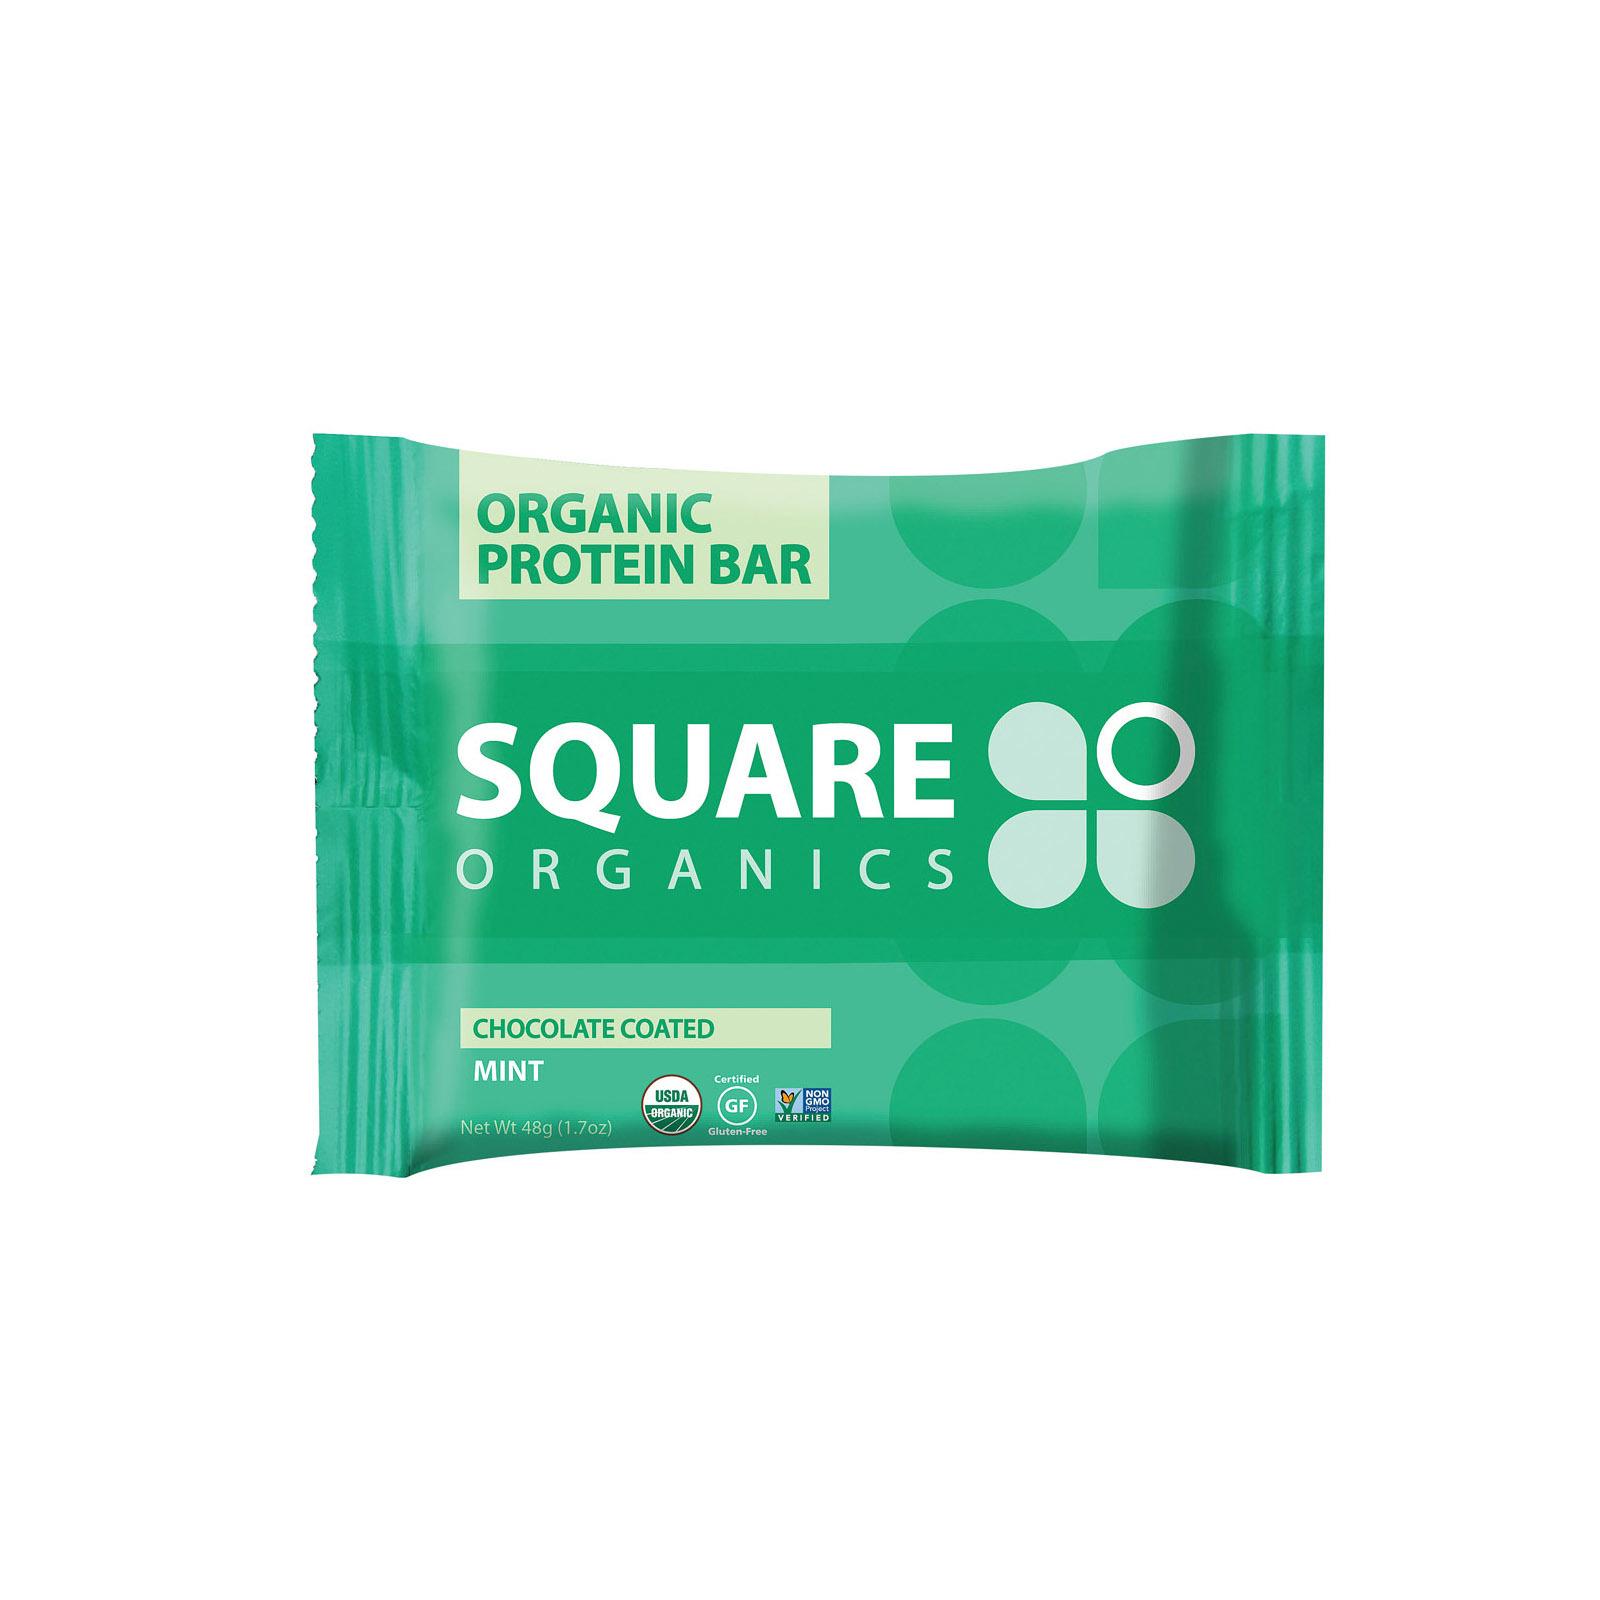 Square Organics Organic Protein Bar - Chocolate Coated Mint - Case of 12 - 1.7 oz